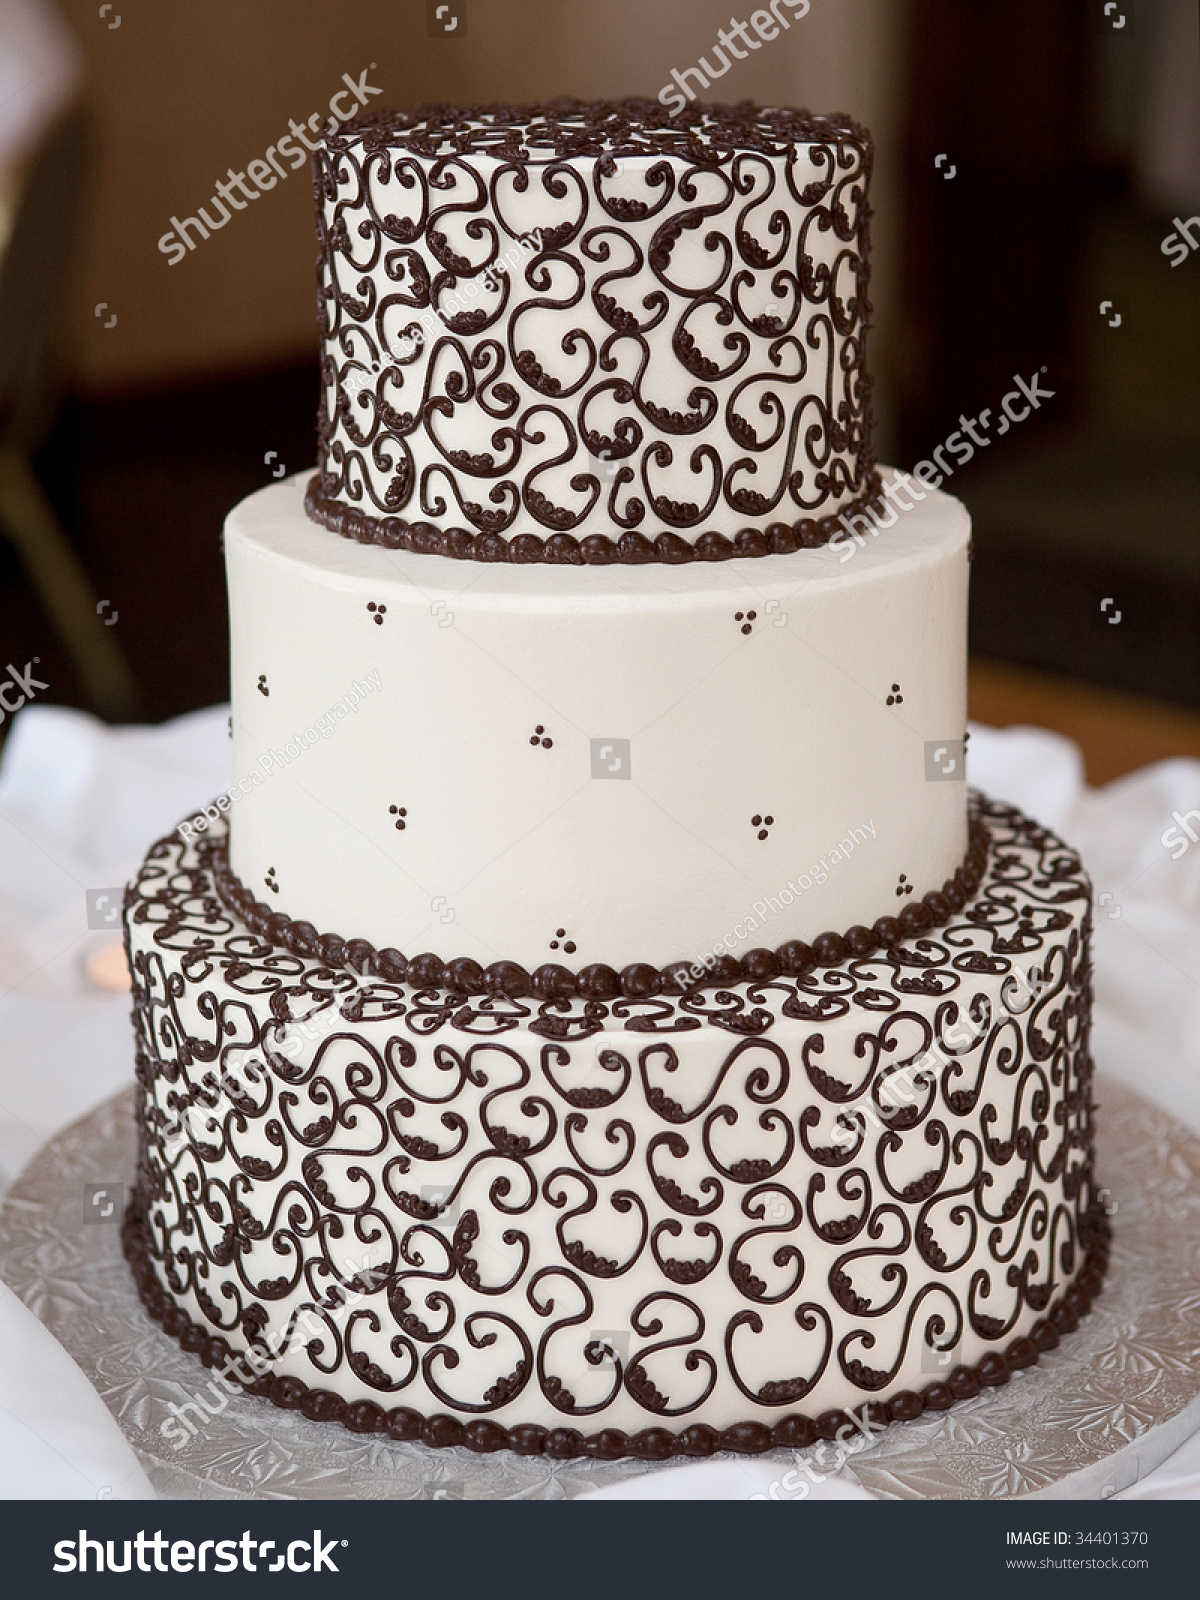 Scroll Design Cake Stock Photo 34401370 Shutterstock